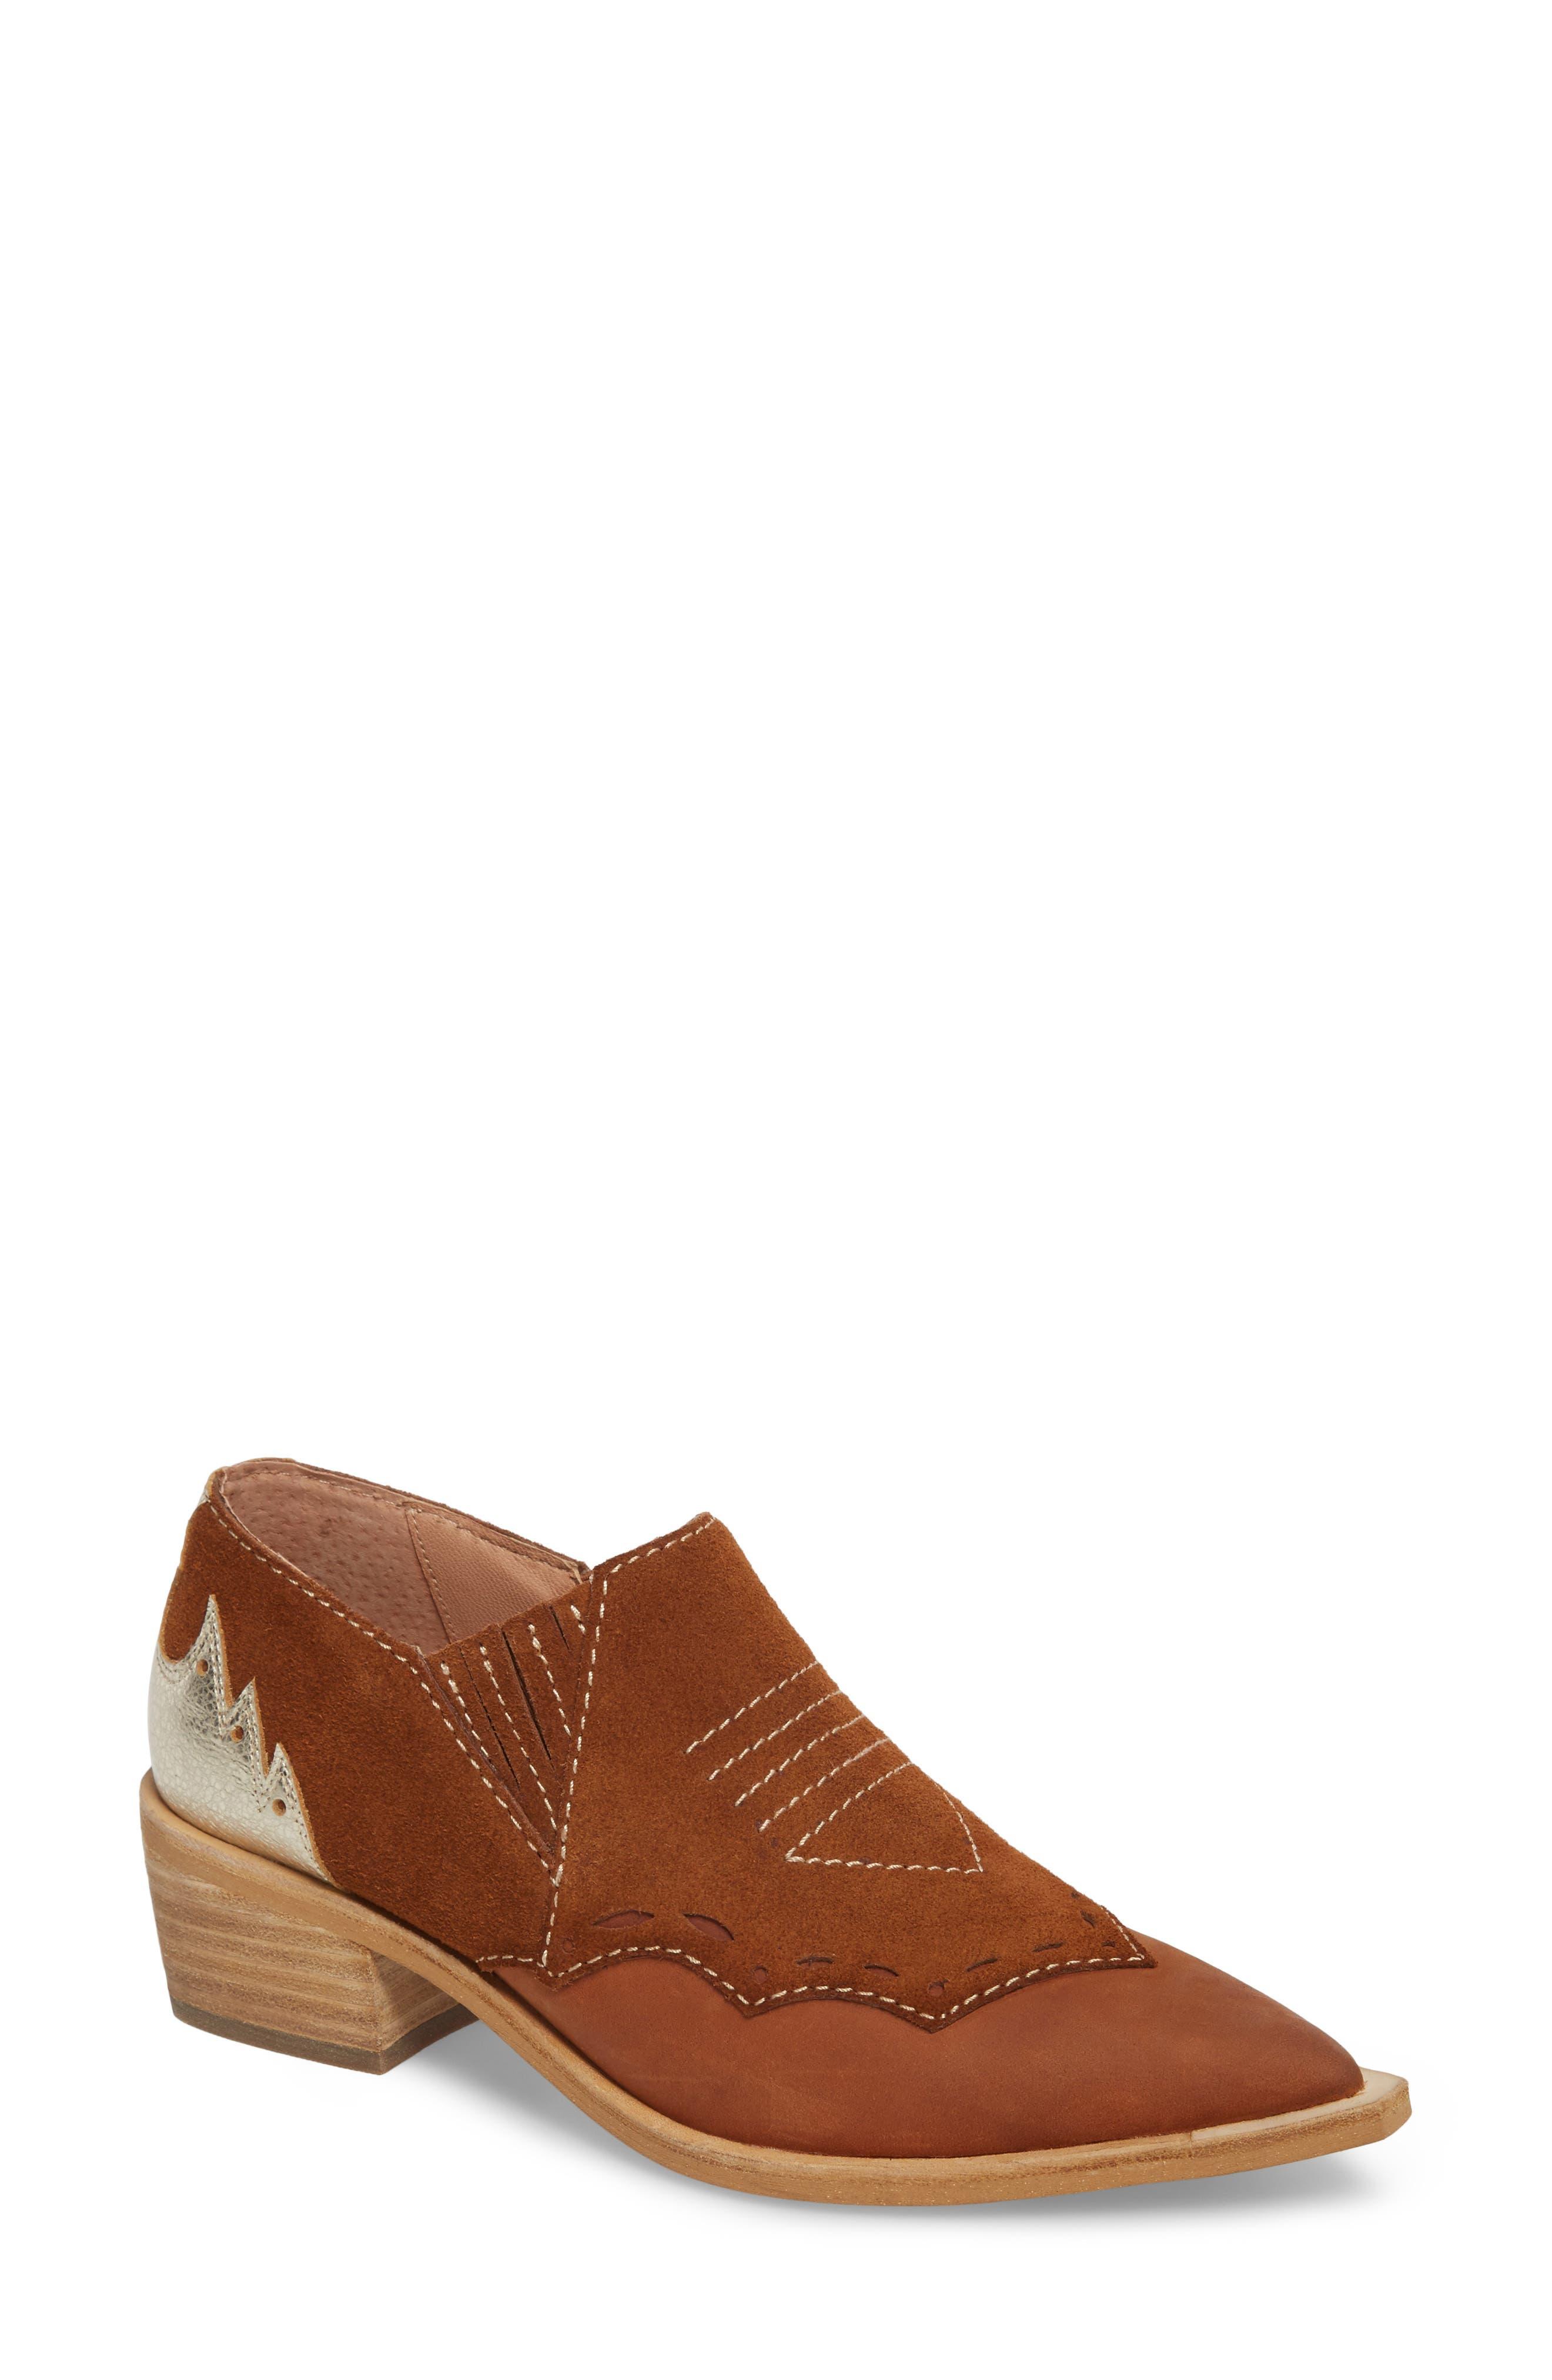 Warner Western Bootie,                             Main thumbnail 1, color,                             Brown/ Deep Maroon Leather